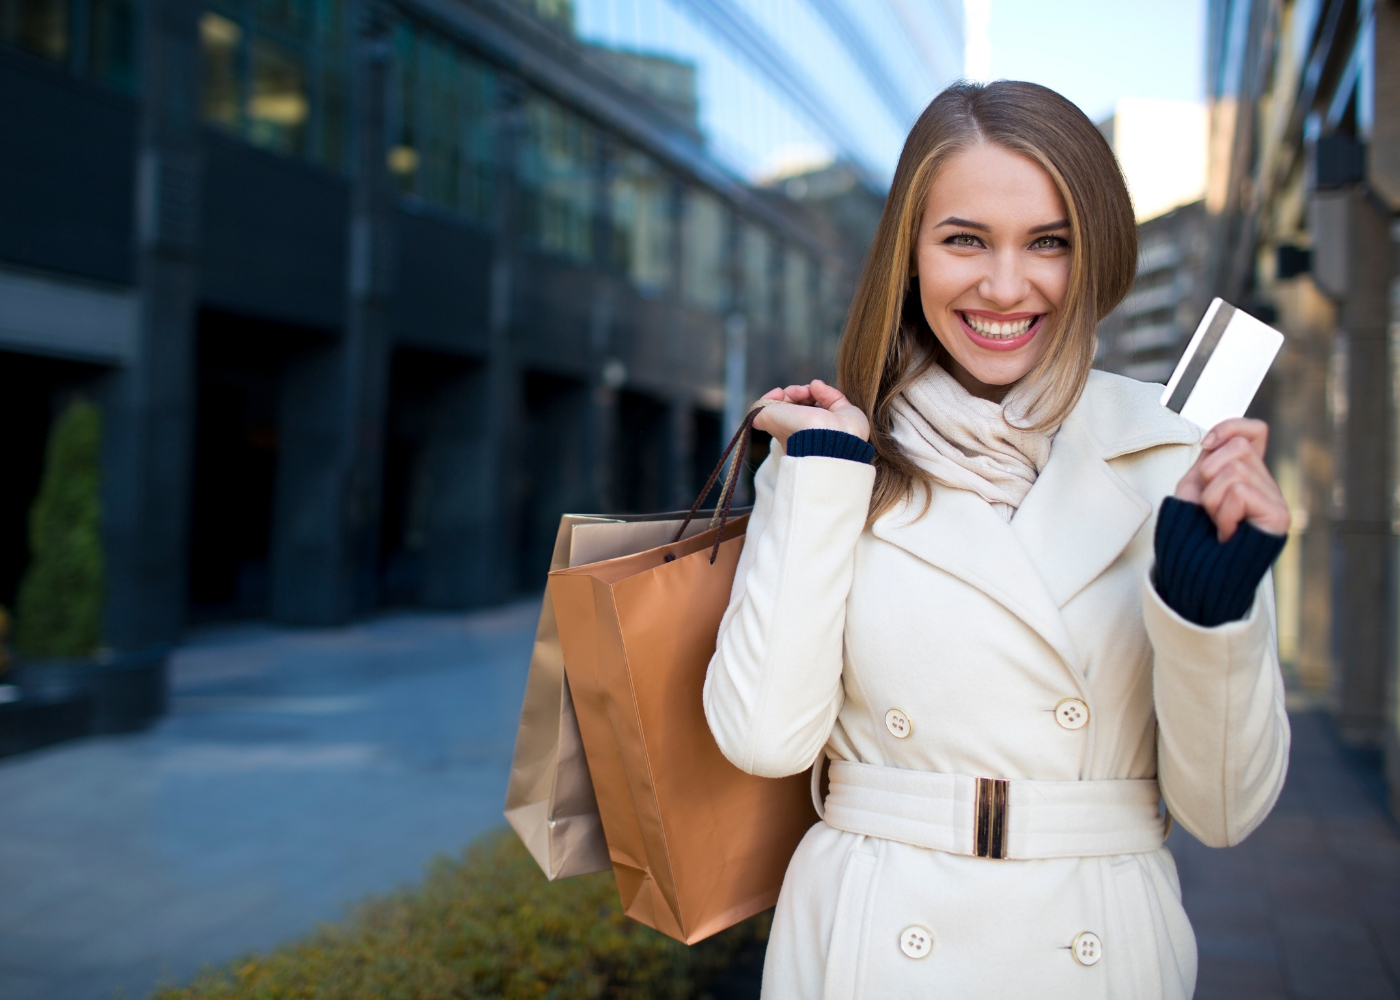 purchasing using credit card